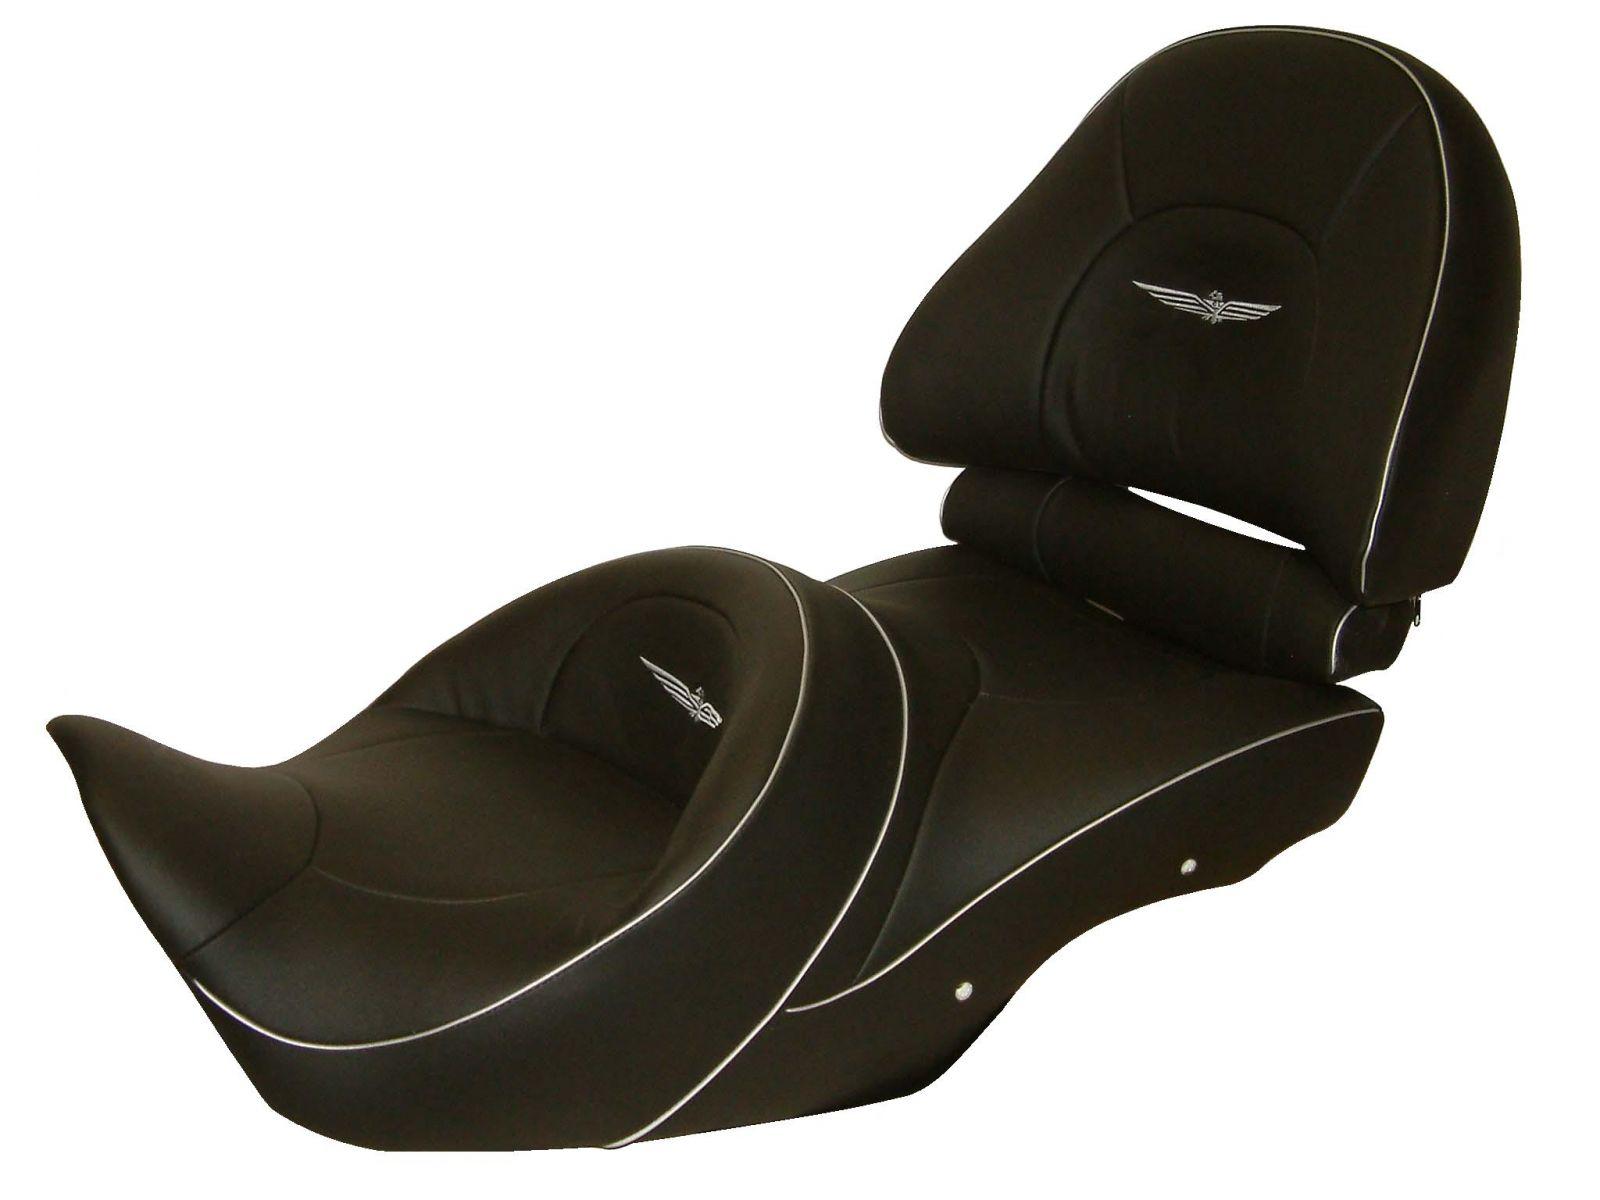 Deluxe seat SGC3095 - HONDA GL 1800 GOLDWING [2001-2005]